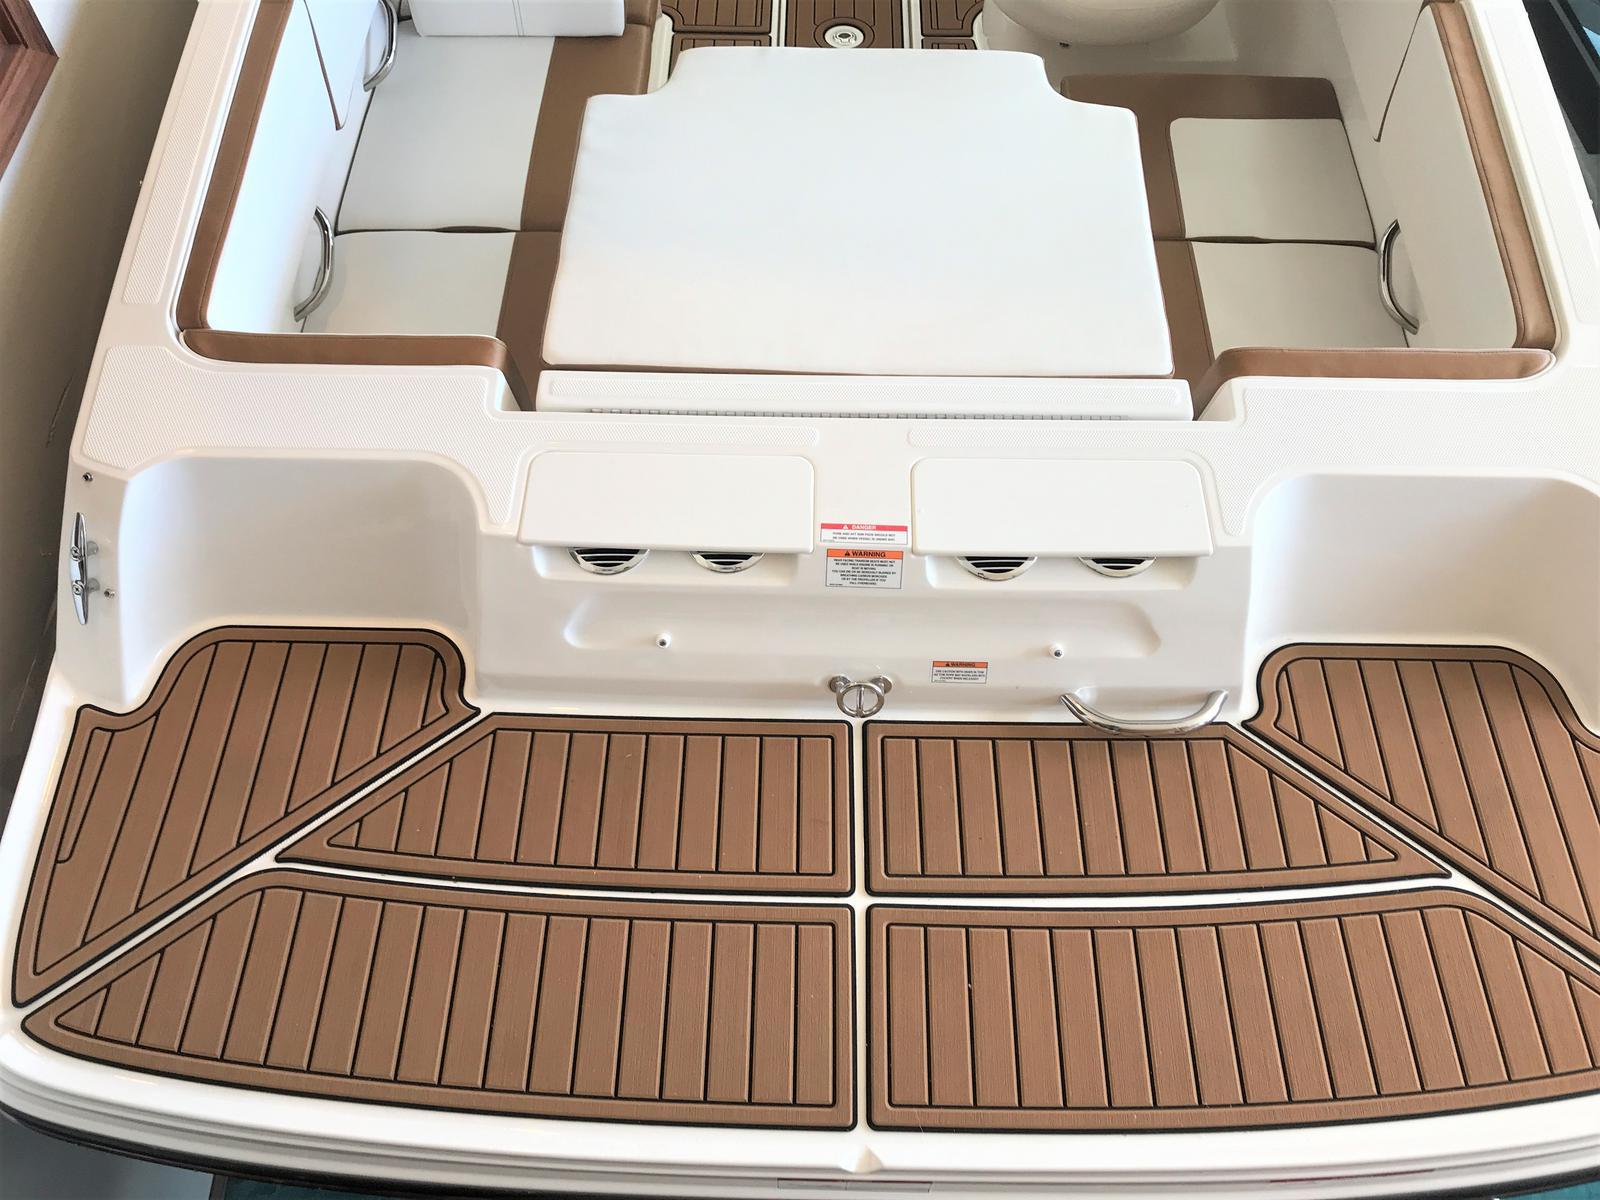 2019 Bayliner boat for sale, model of the boat is VR4 Bowrider & Image # 2 of 22